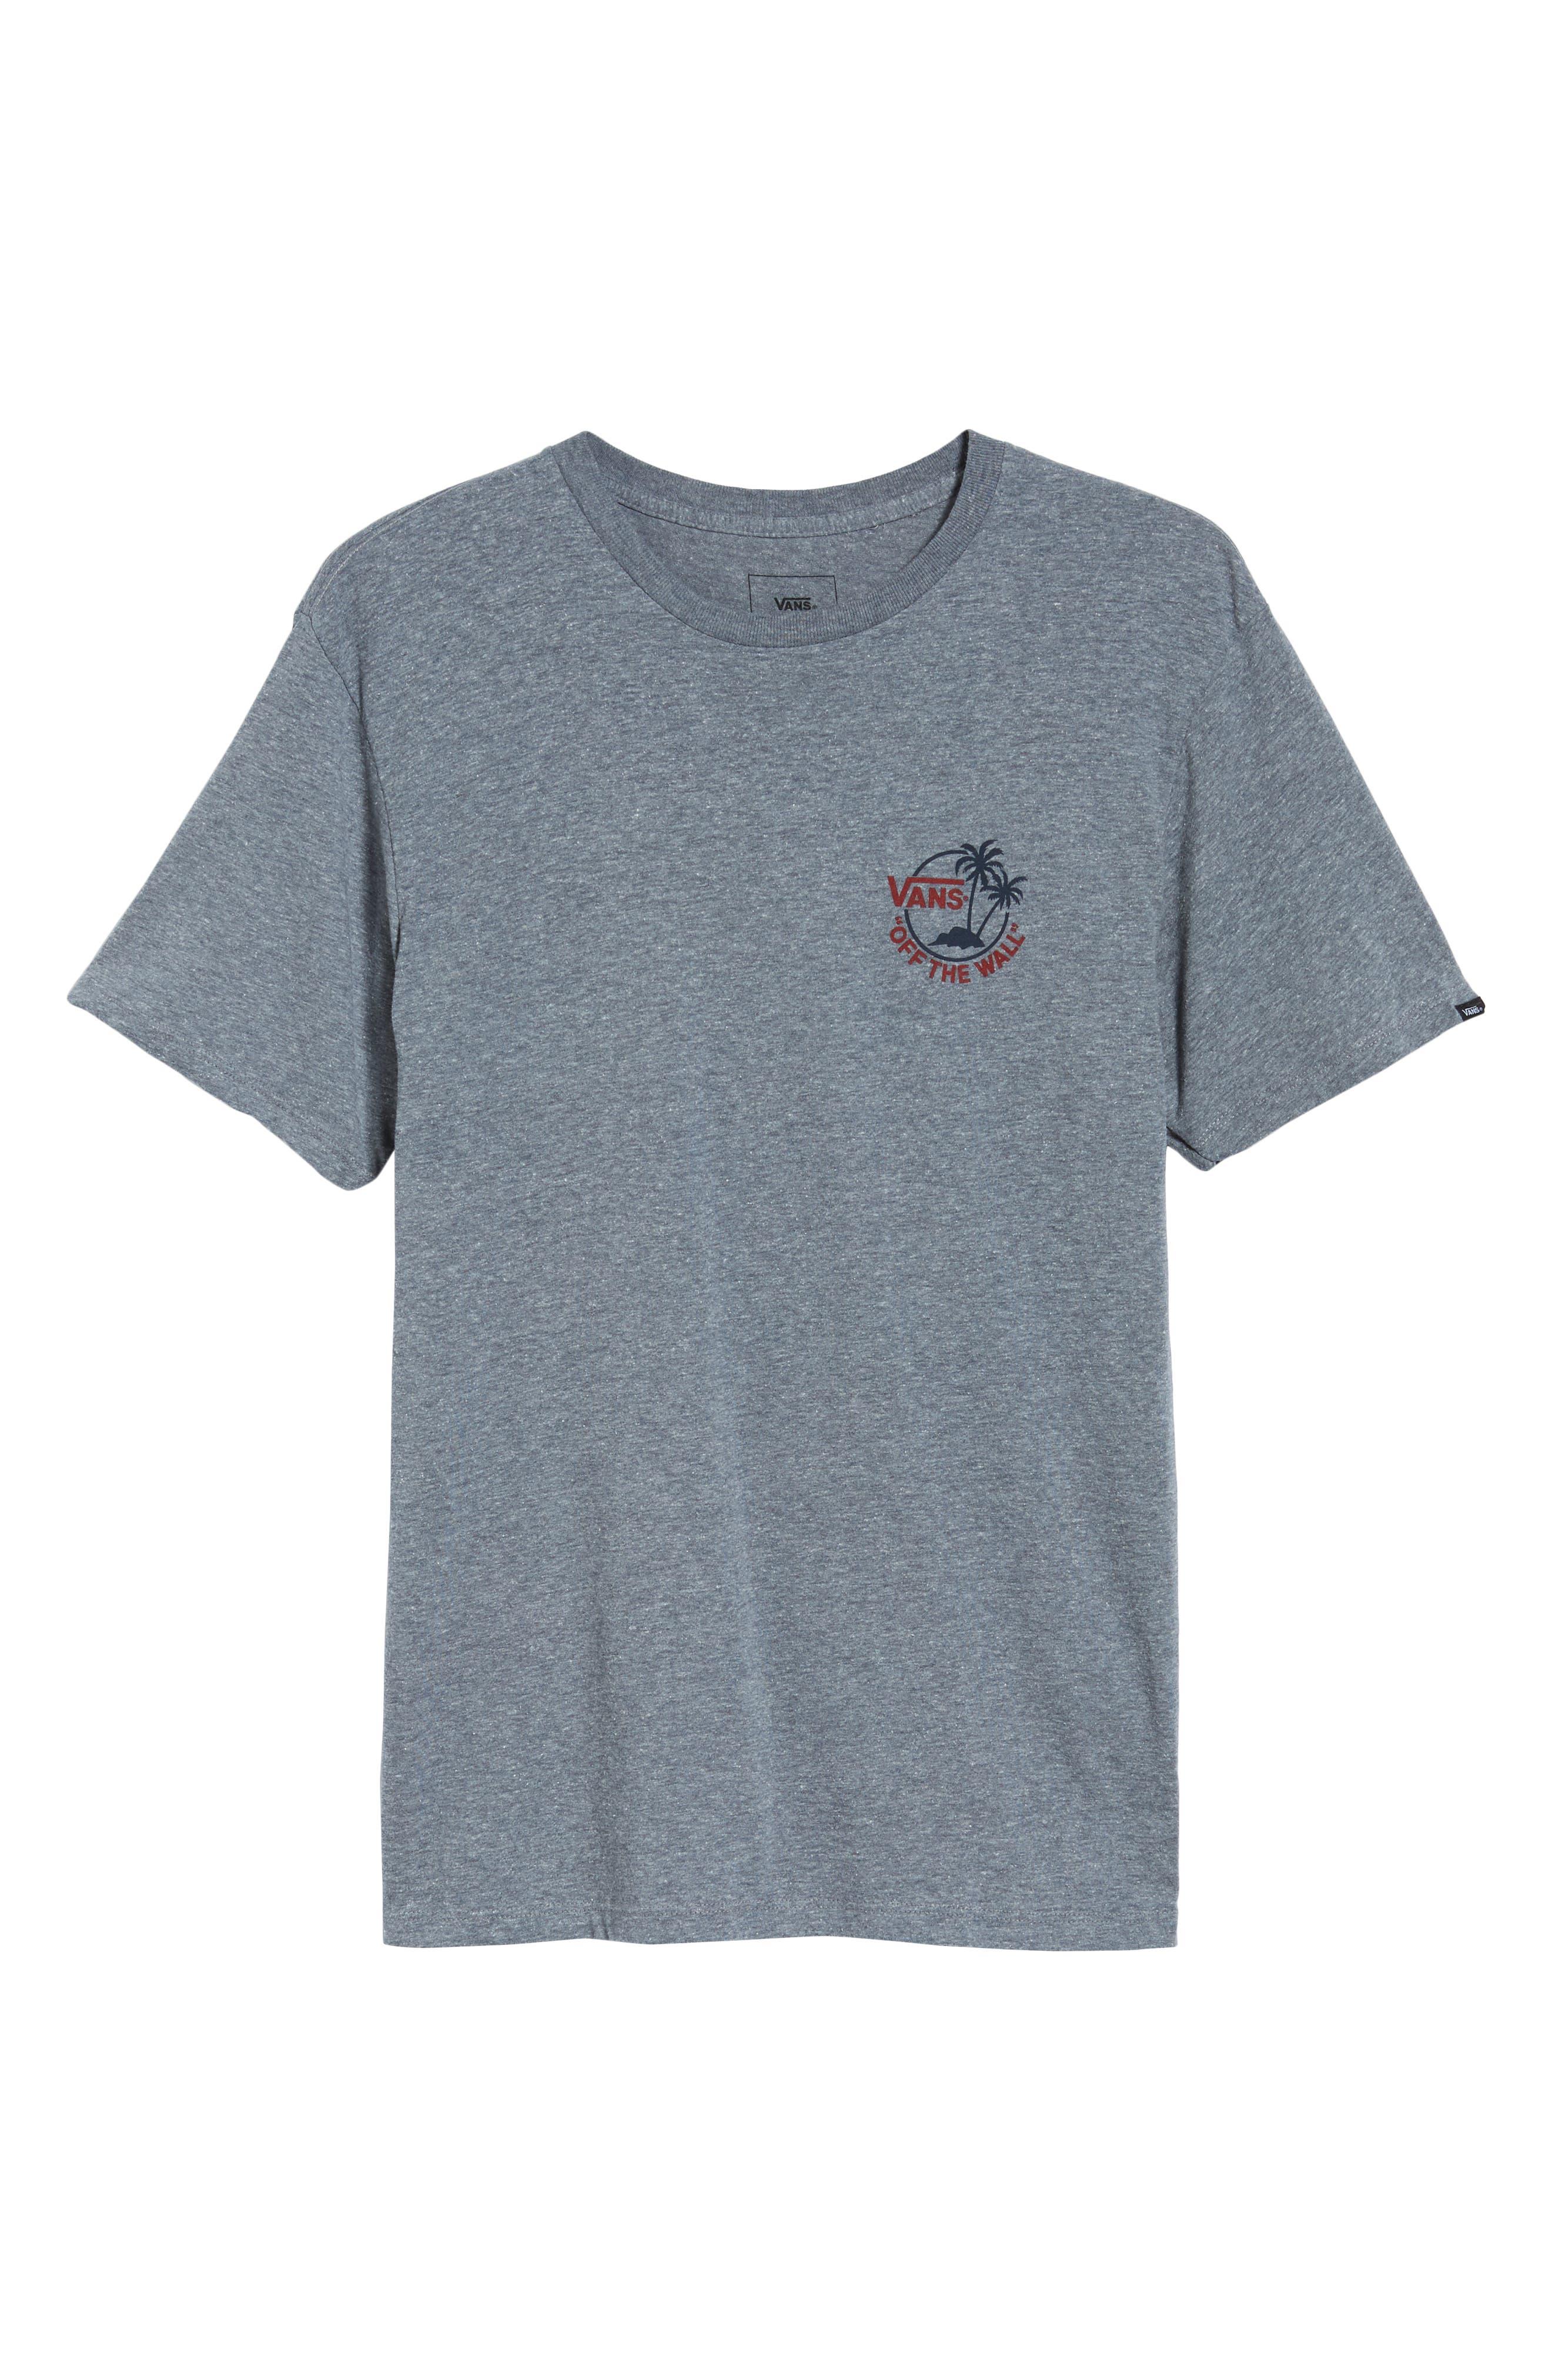 Mini Dual Palm III T-Shirt,                             Alternate thumbnail 6, color,                             HEATHER GREY/ CHILI PEPPER